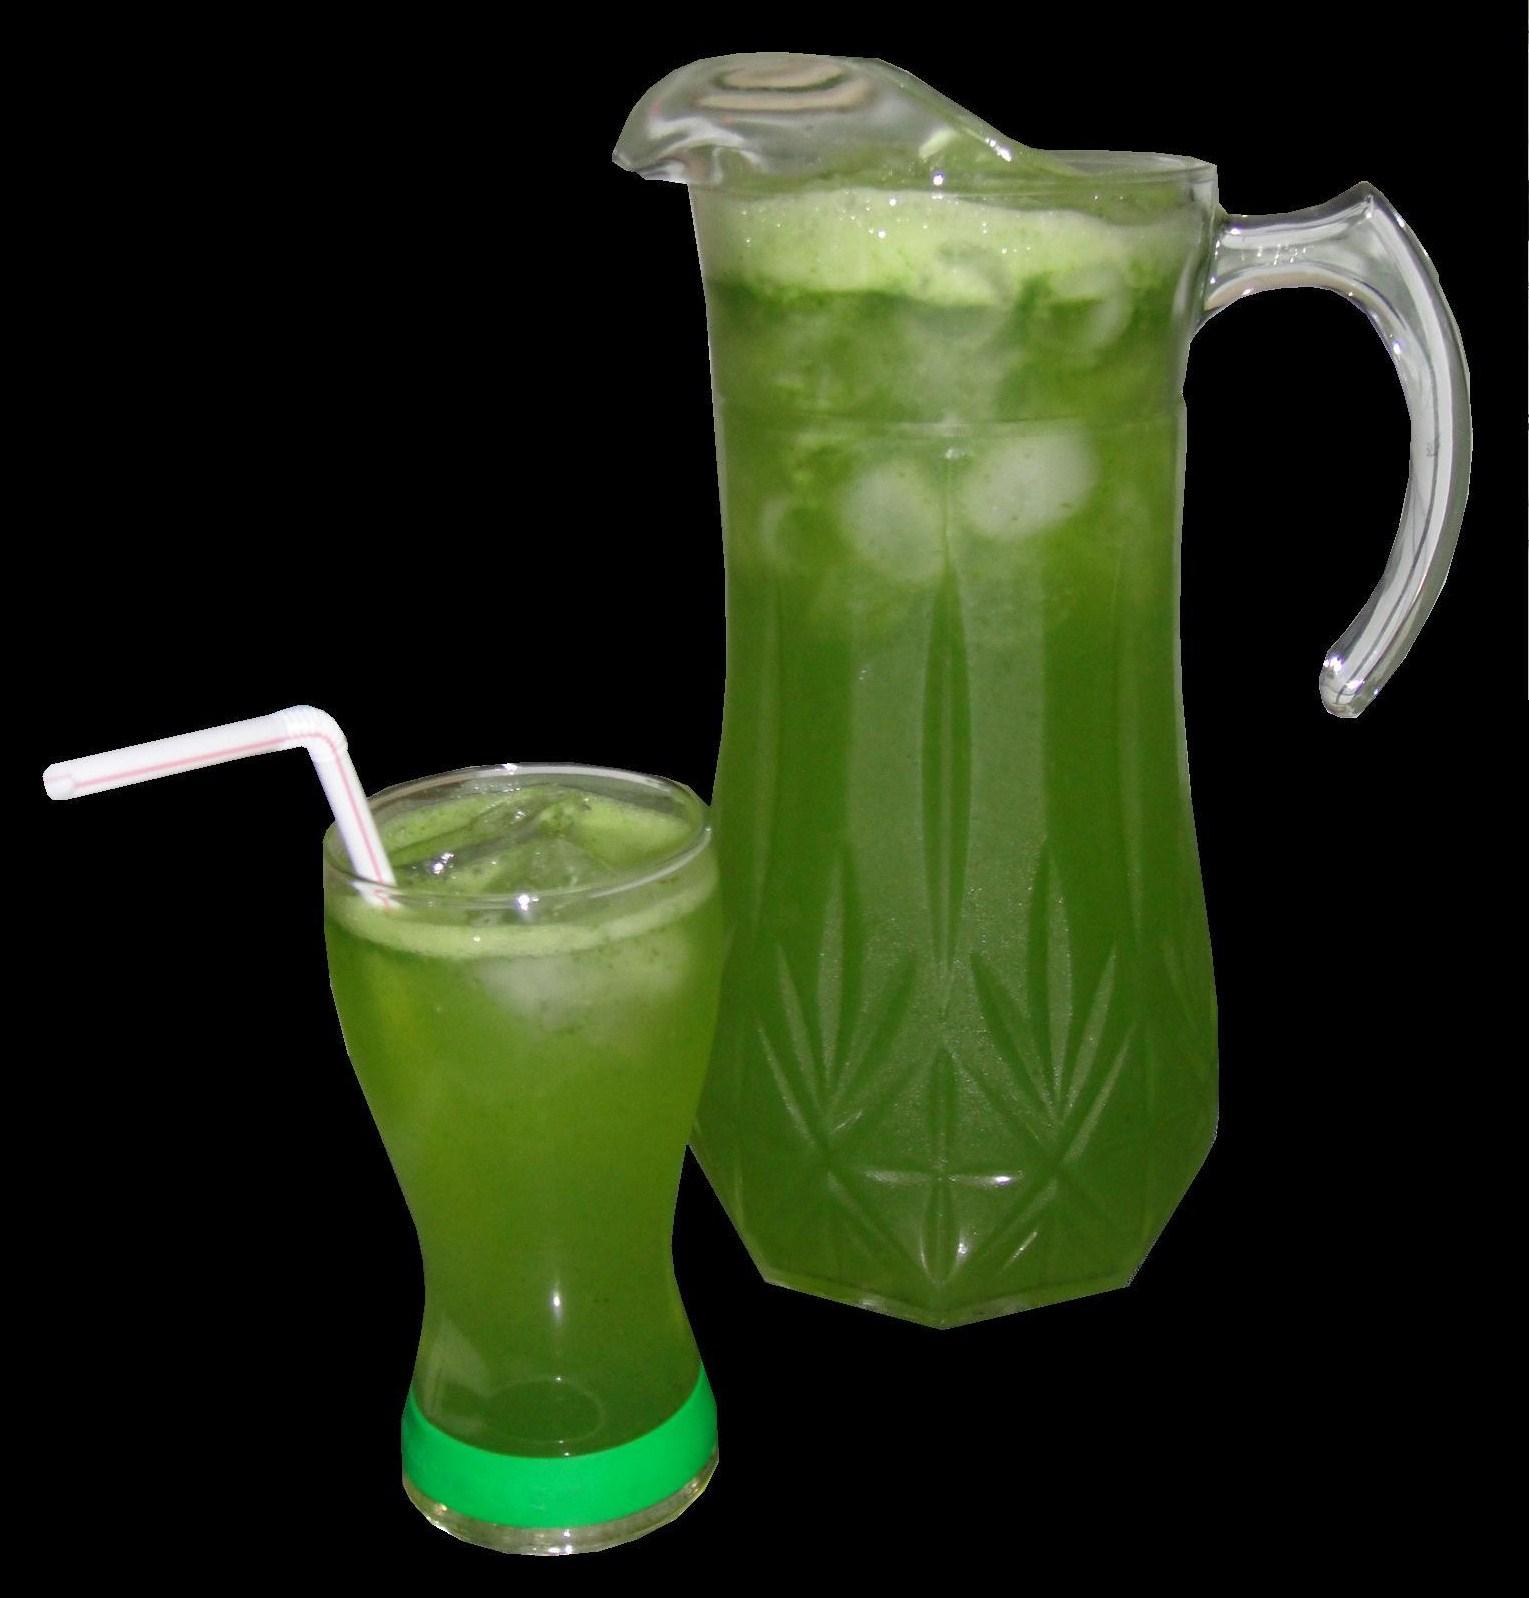 Maryam's Culinary Wonders: 340. Lemon-Mint Refresher Drink